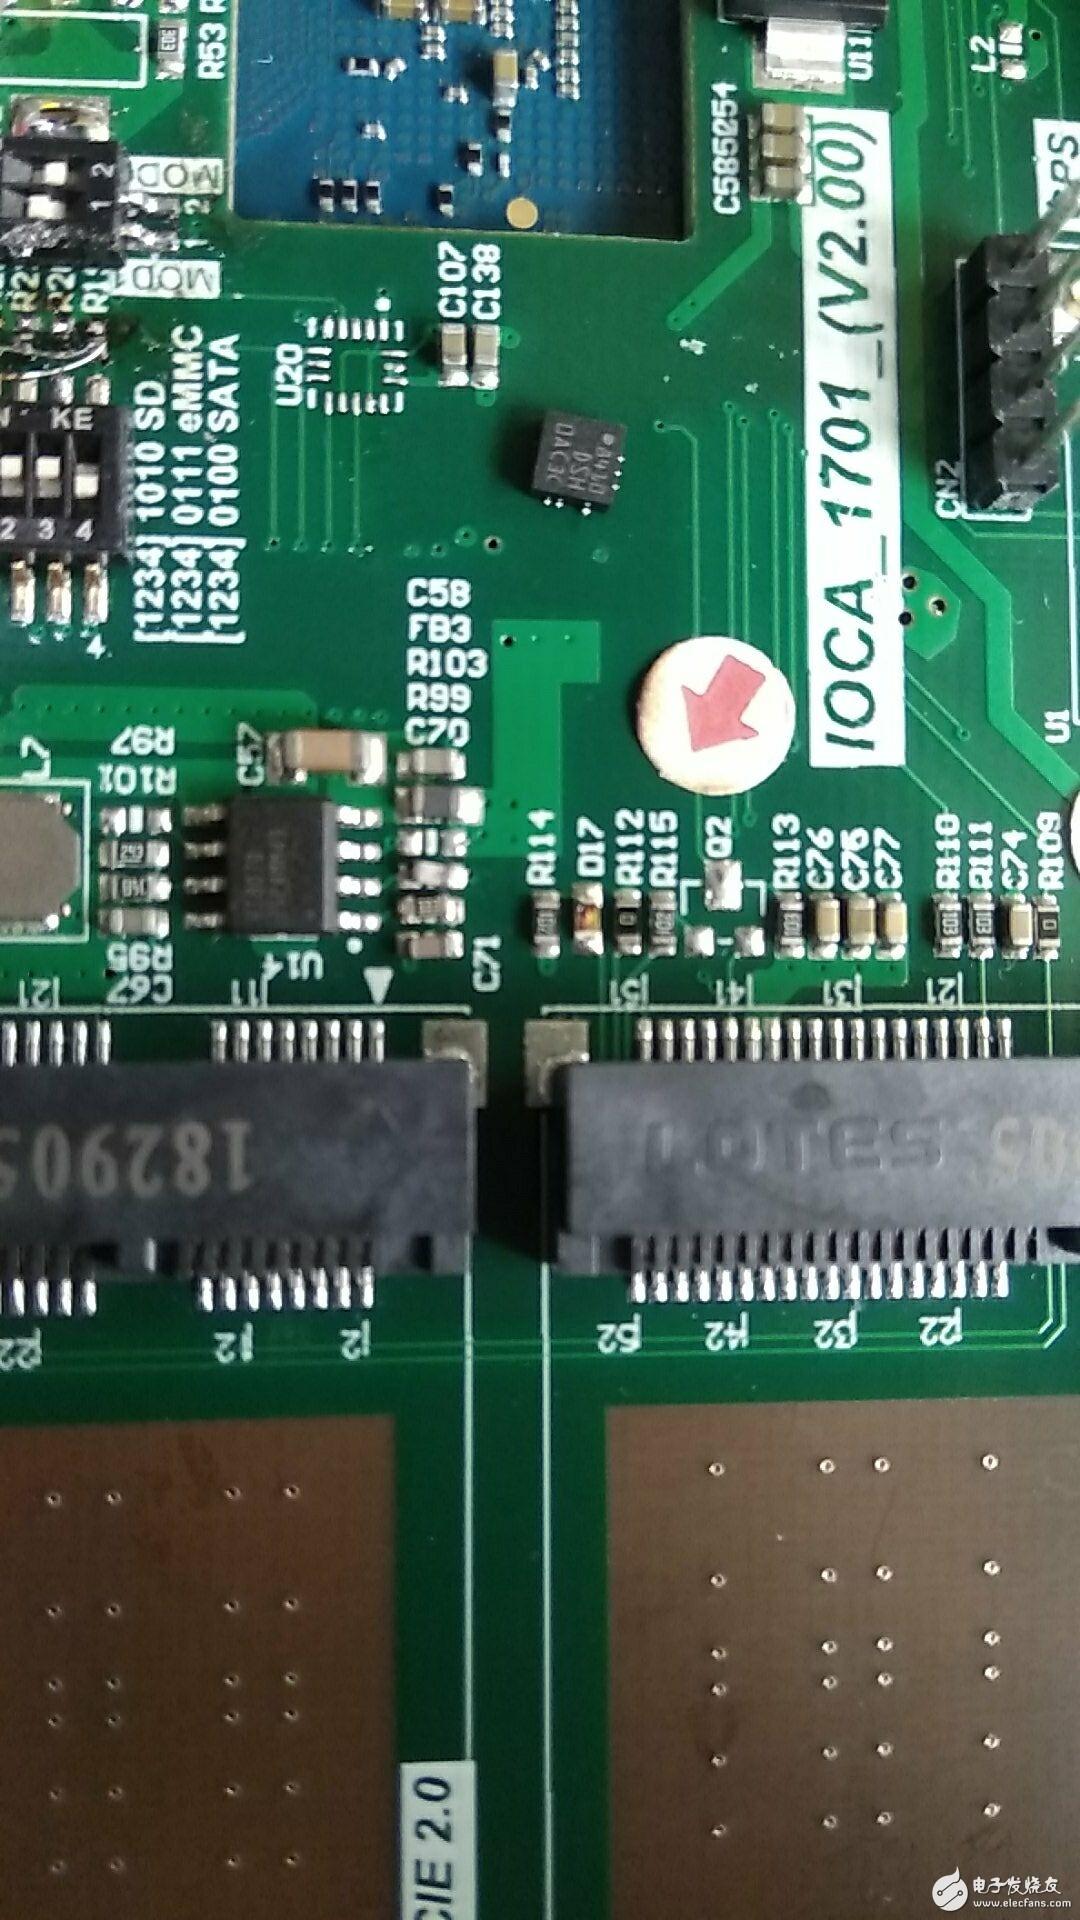 CB140-6Y2C一直进入烧写模式的解决办法